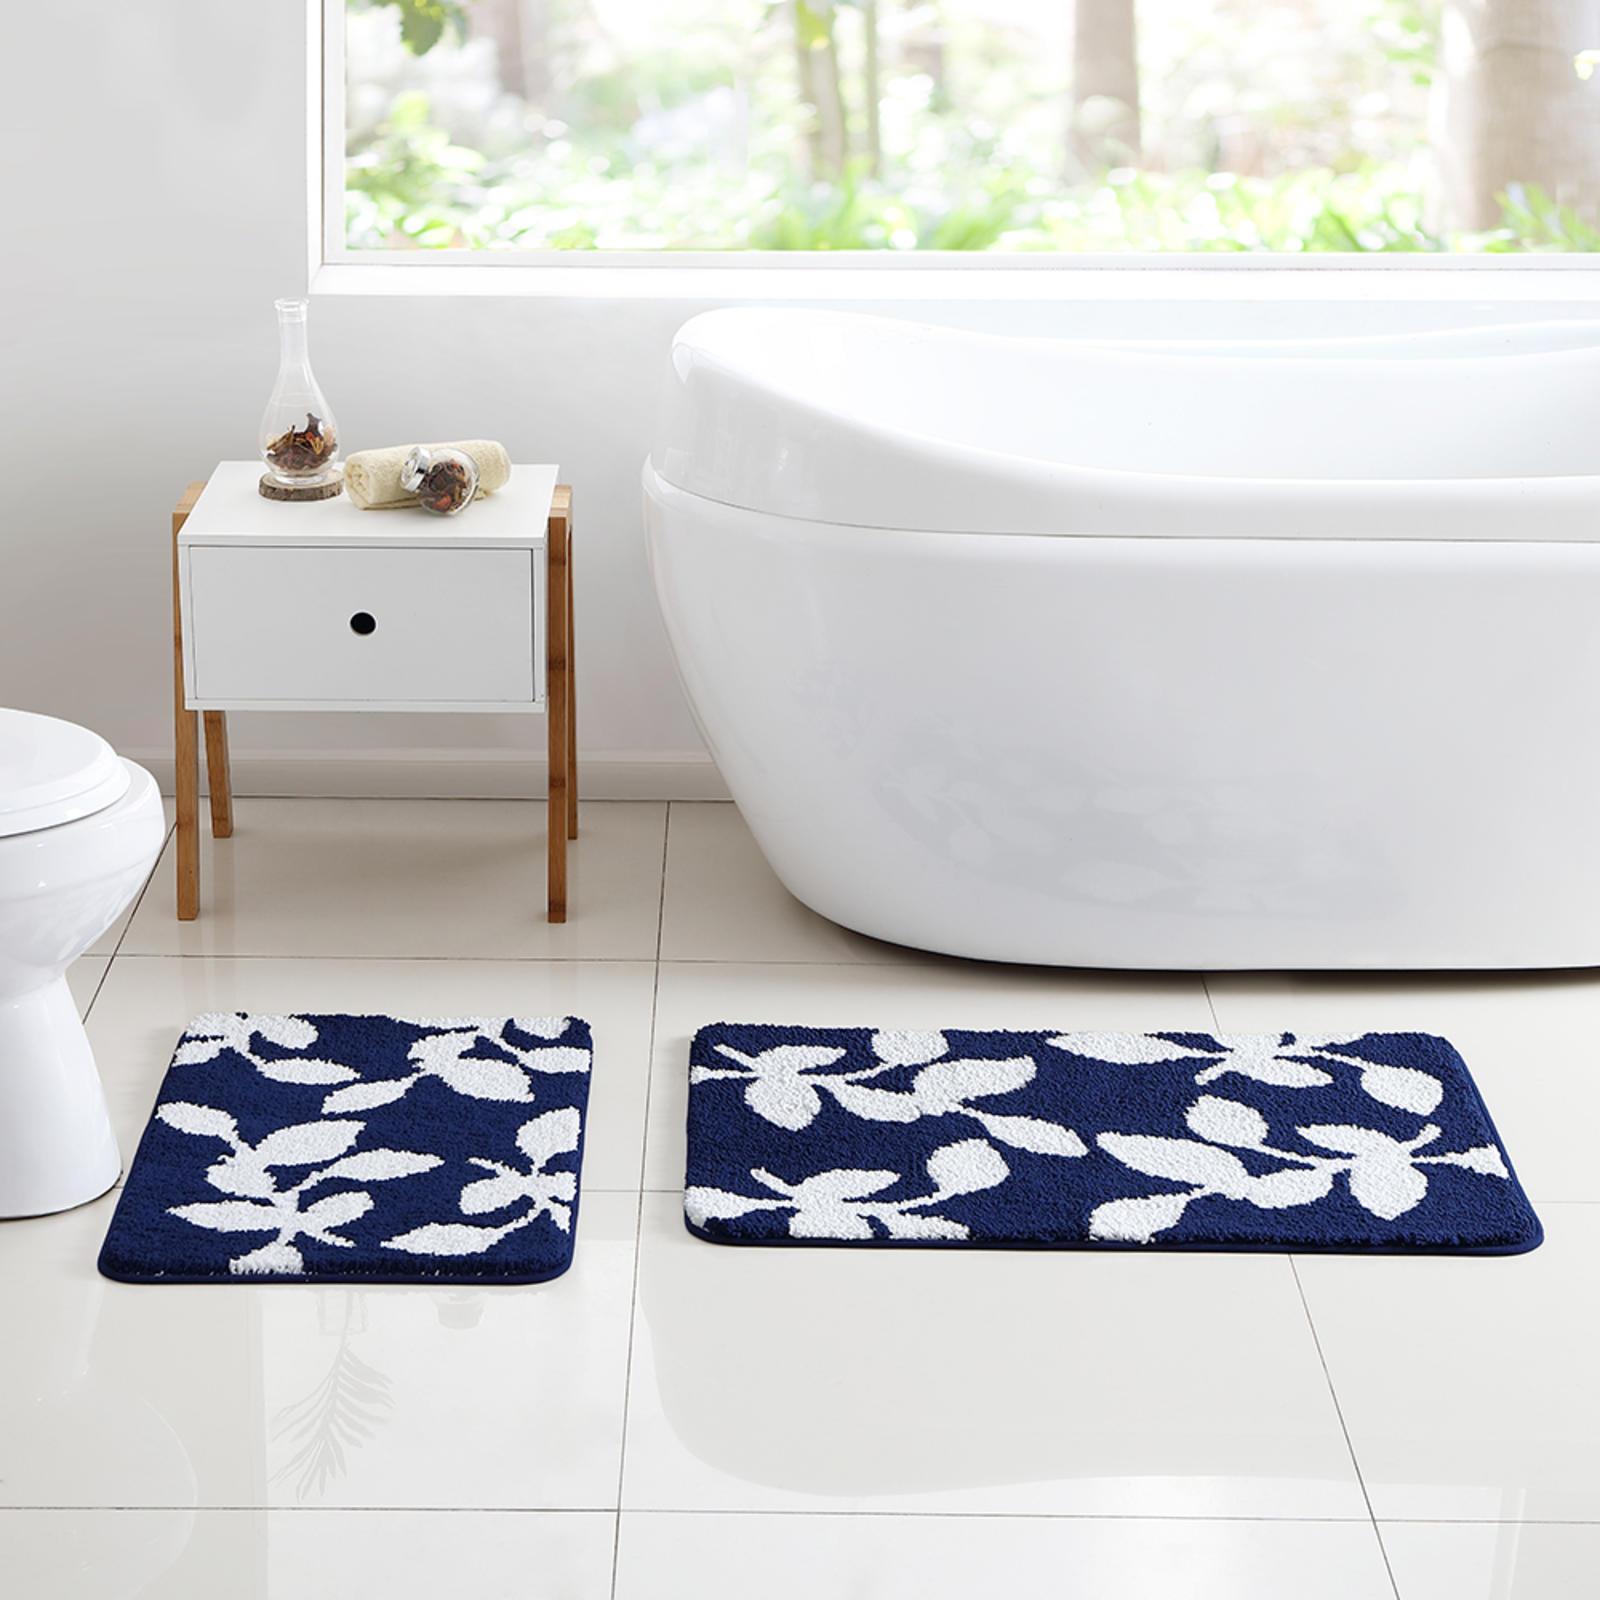 Essential Home 2Pc Leaf Bathroom Rug Set  Navy